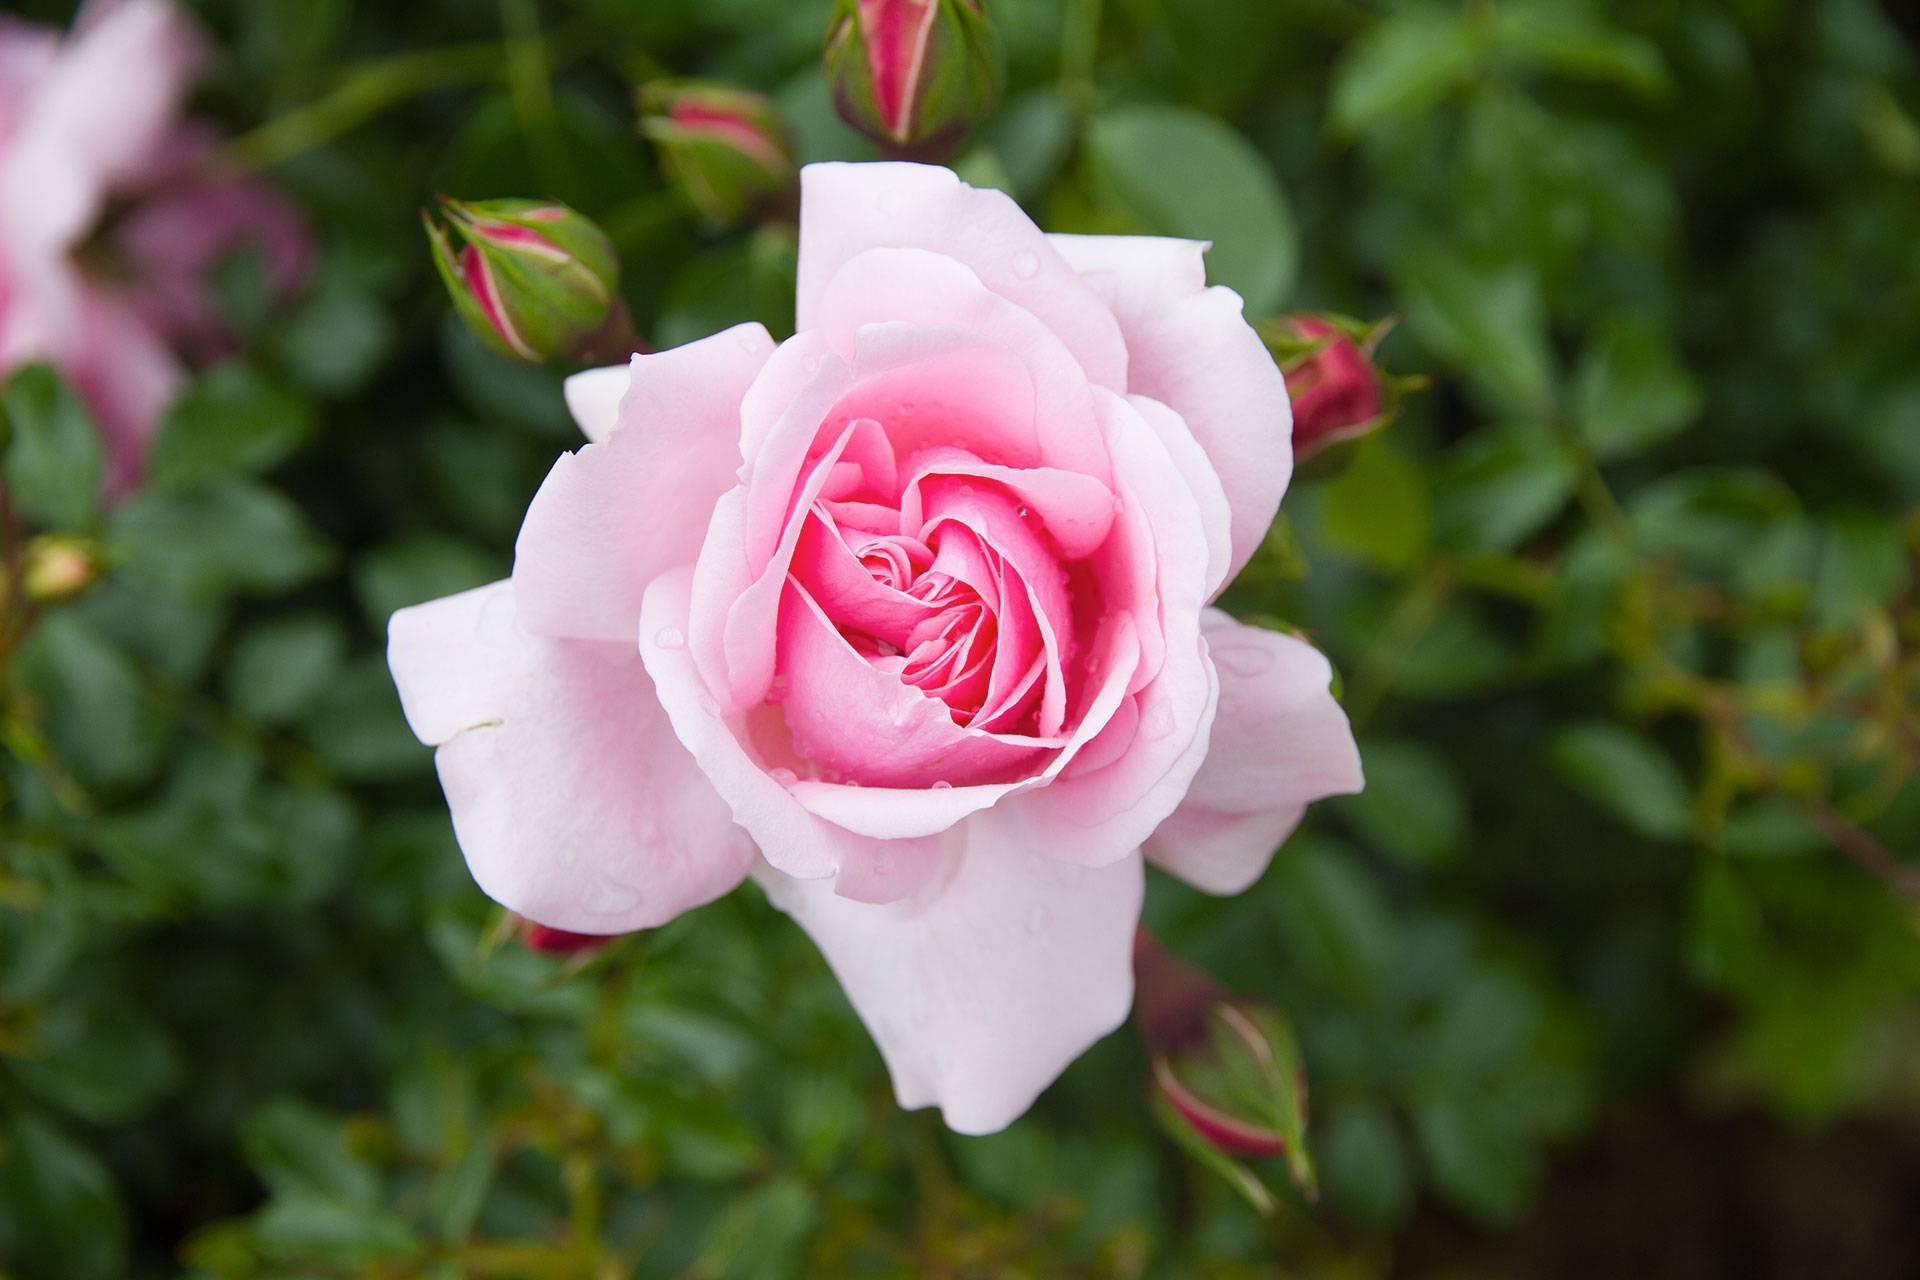 Photo 1: Florence - Le jardin des roses